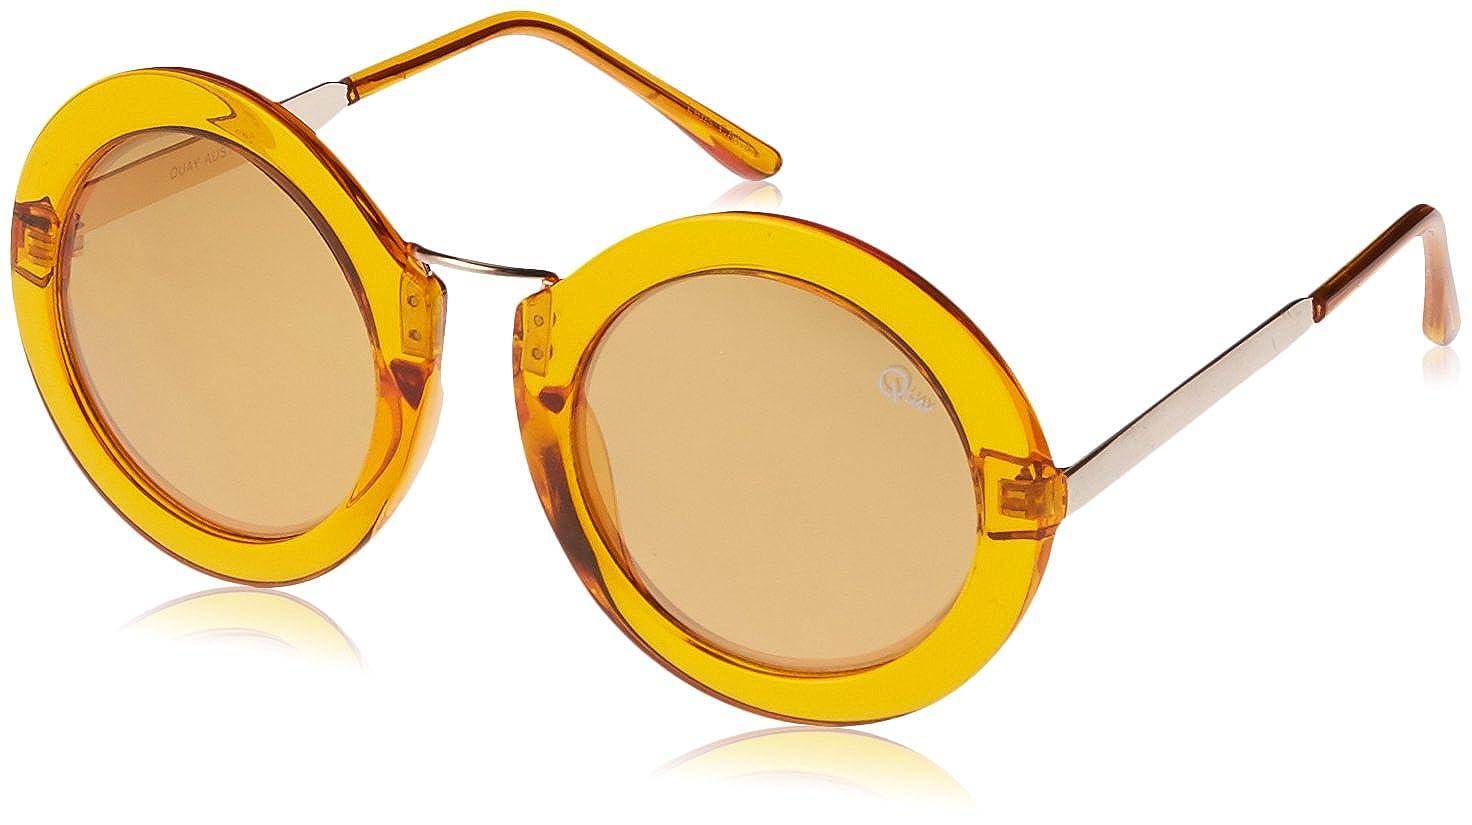 219b4bf9d3 Quay Eyewear Women s Sunglasses Life in Xanadu